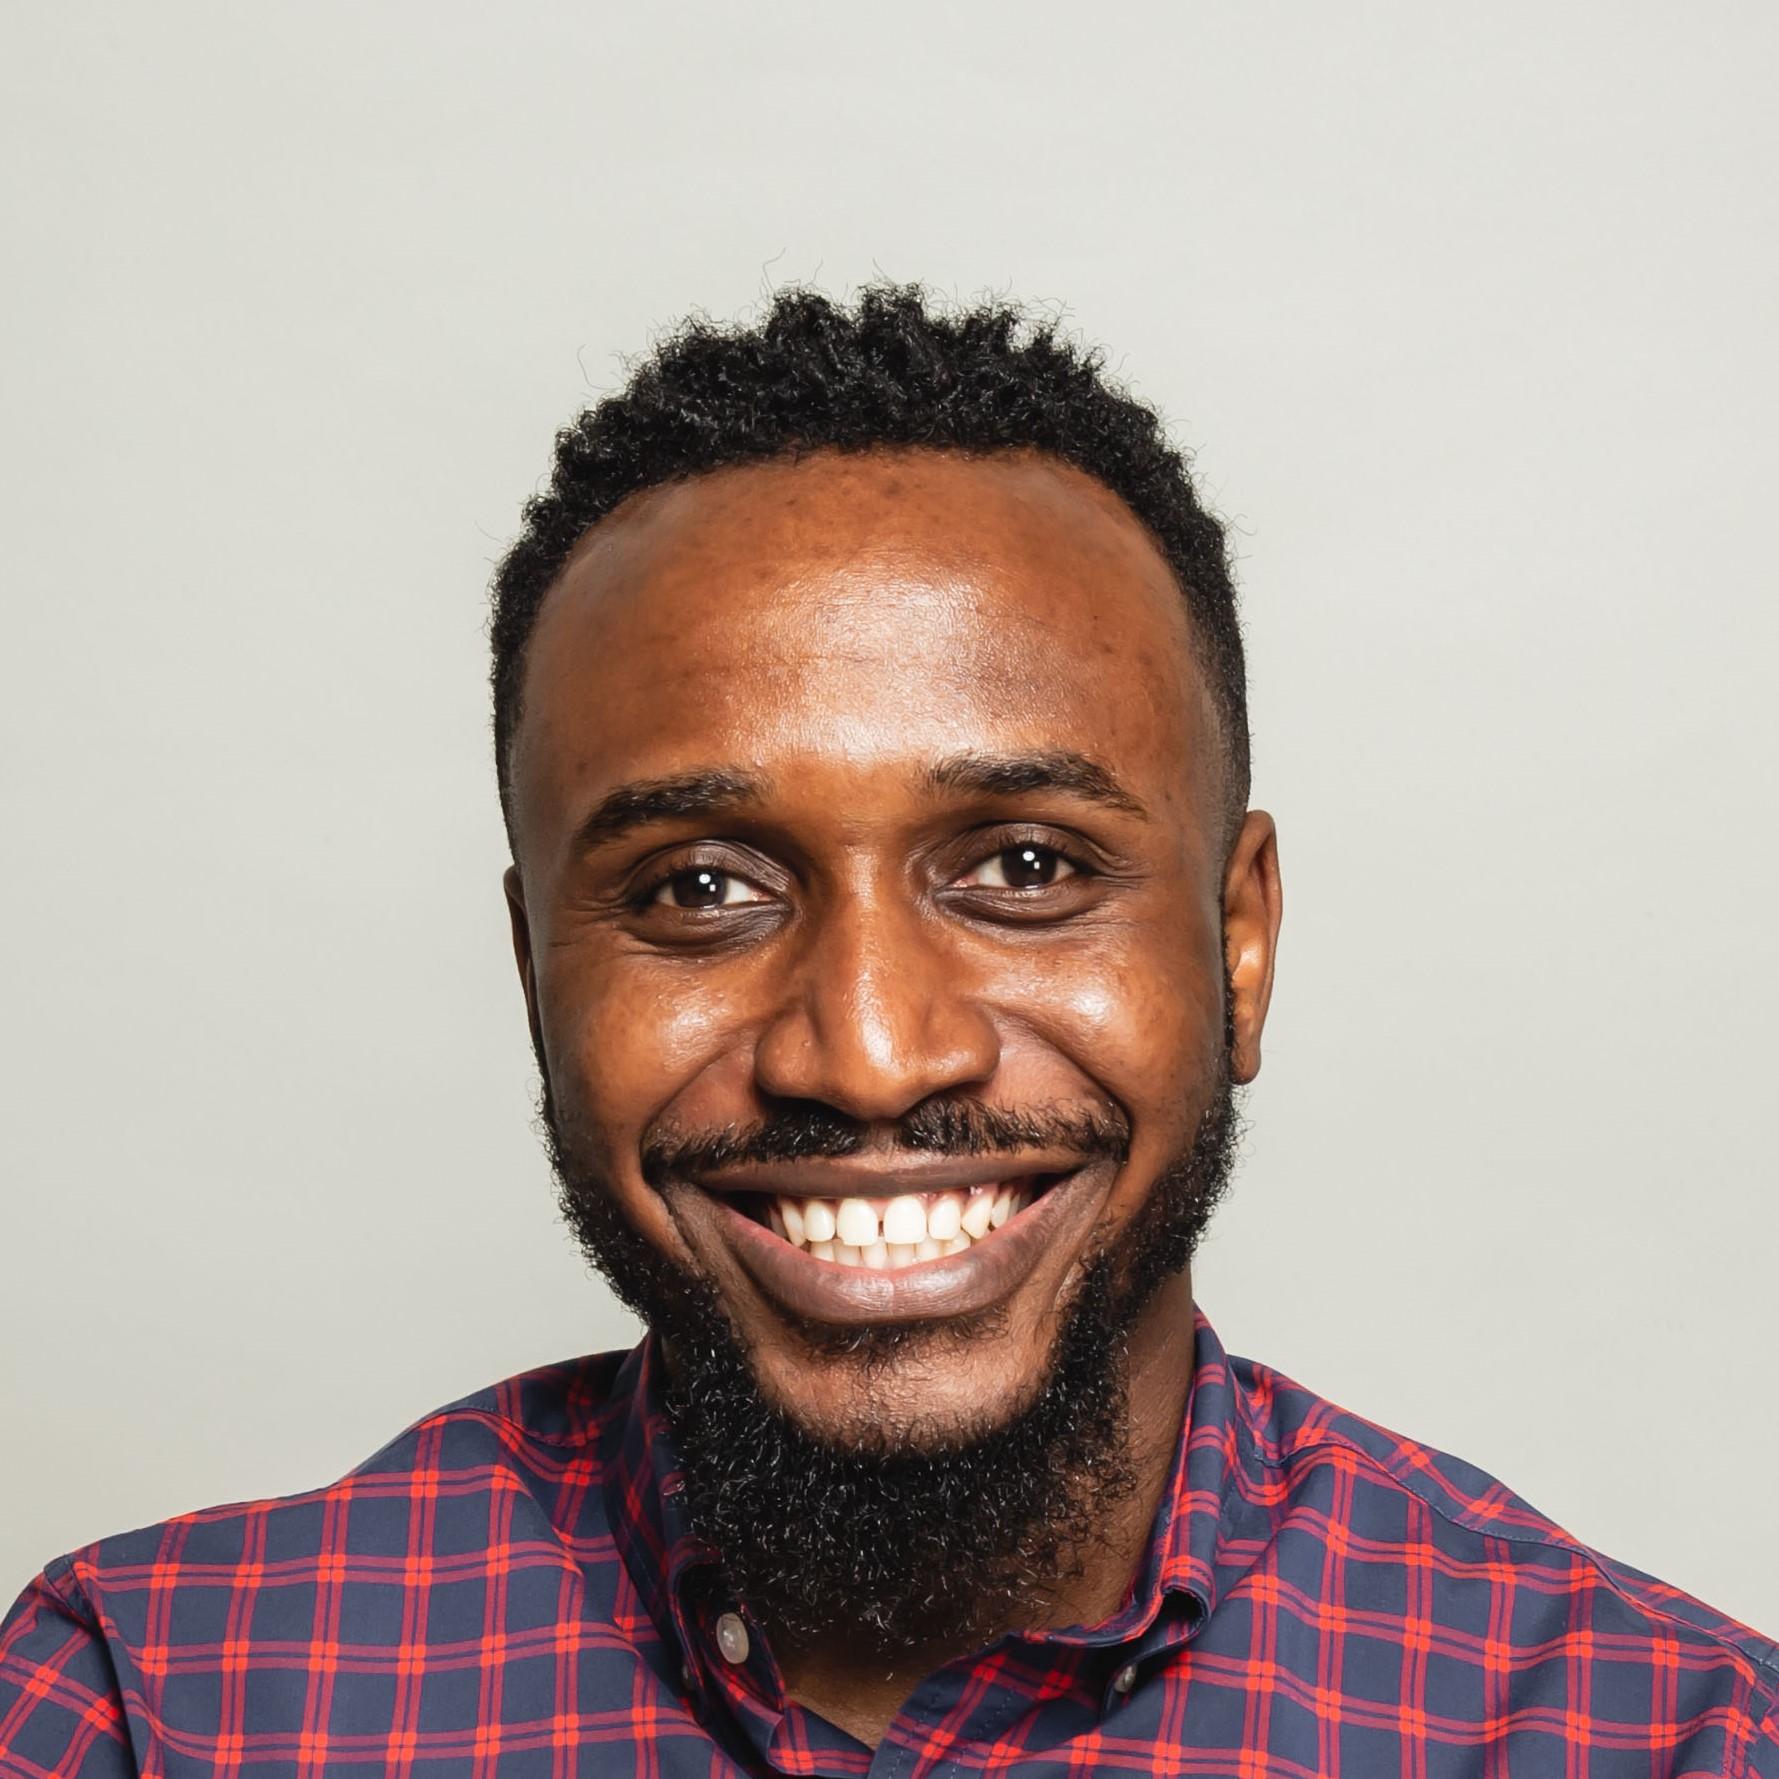 Diversity Training Facilitator Jeffrey Wotherspoon